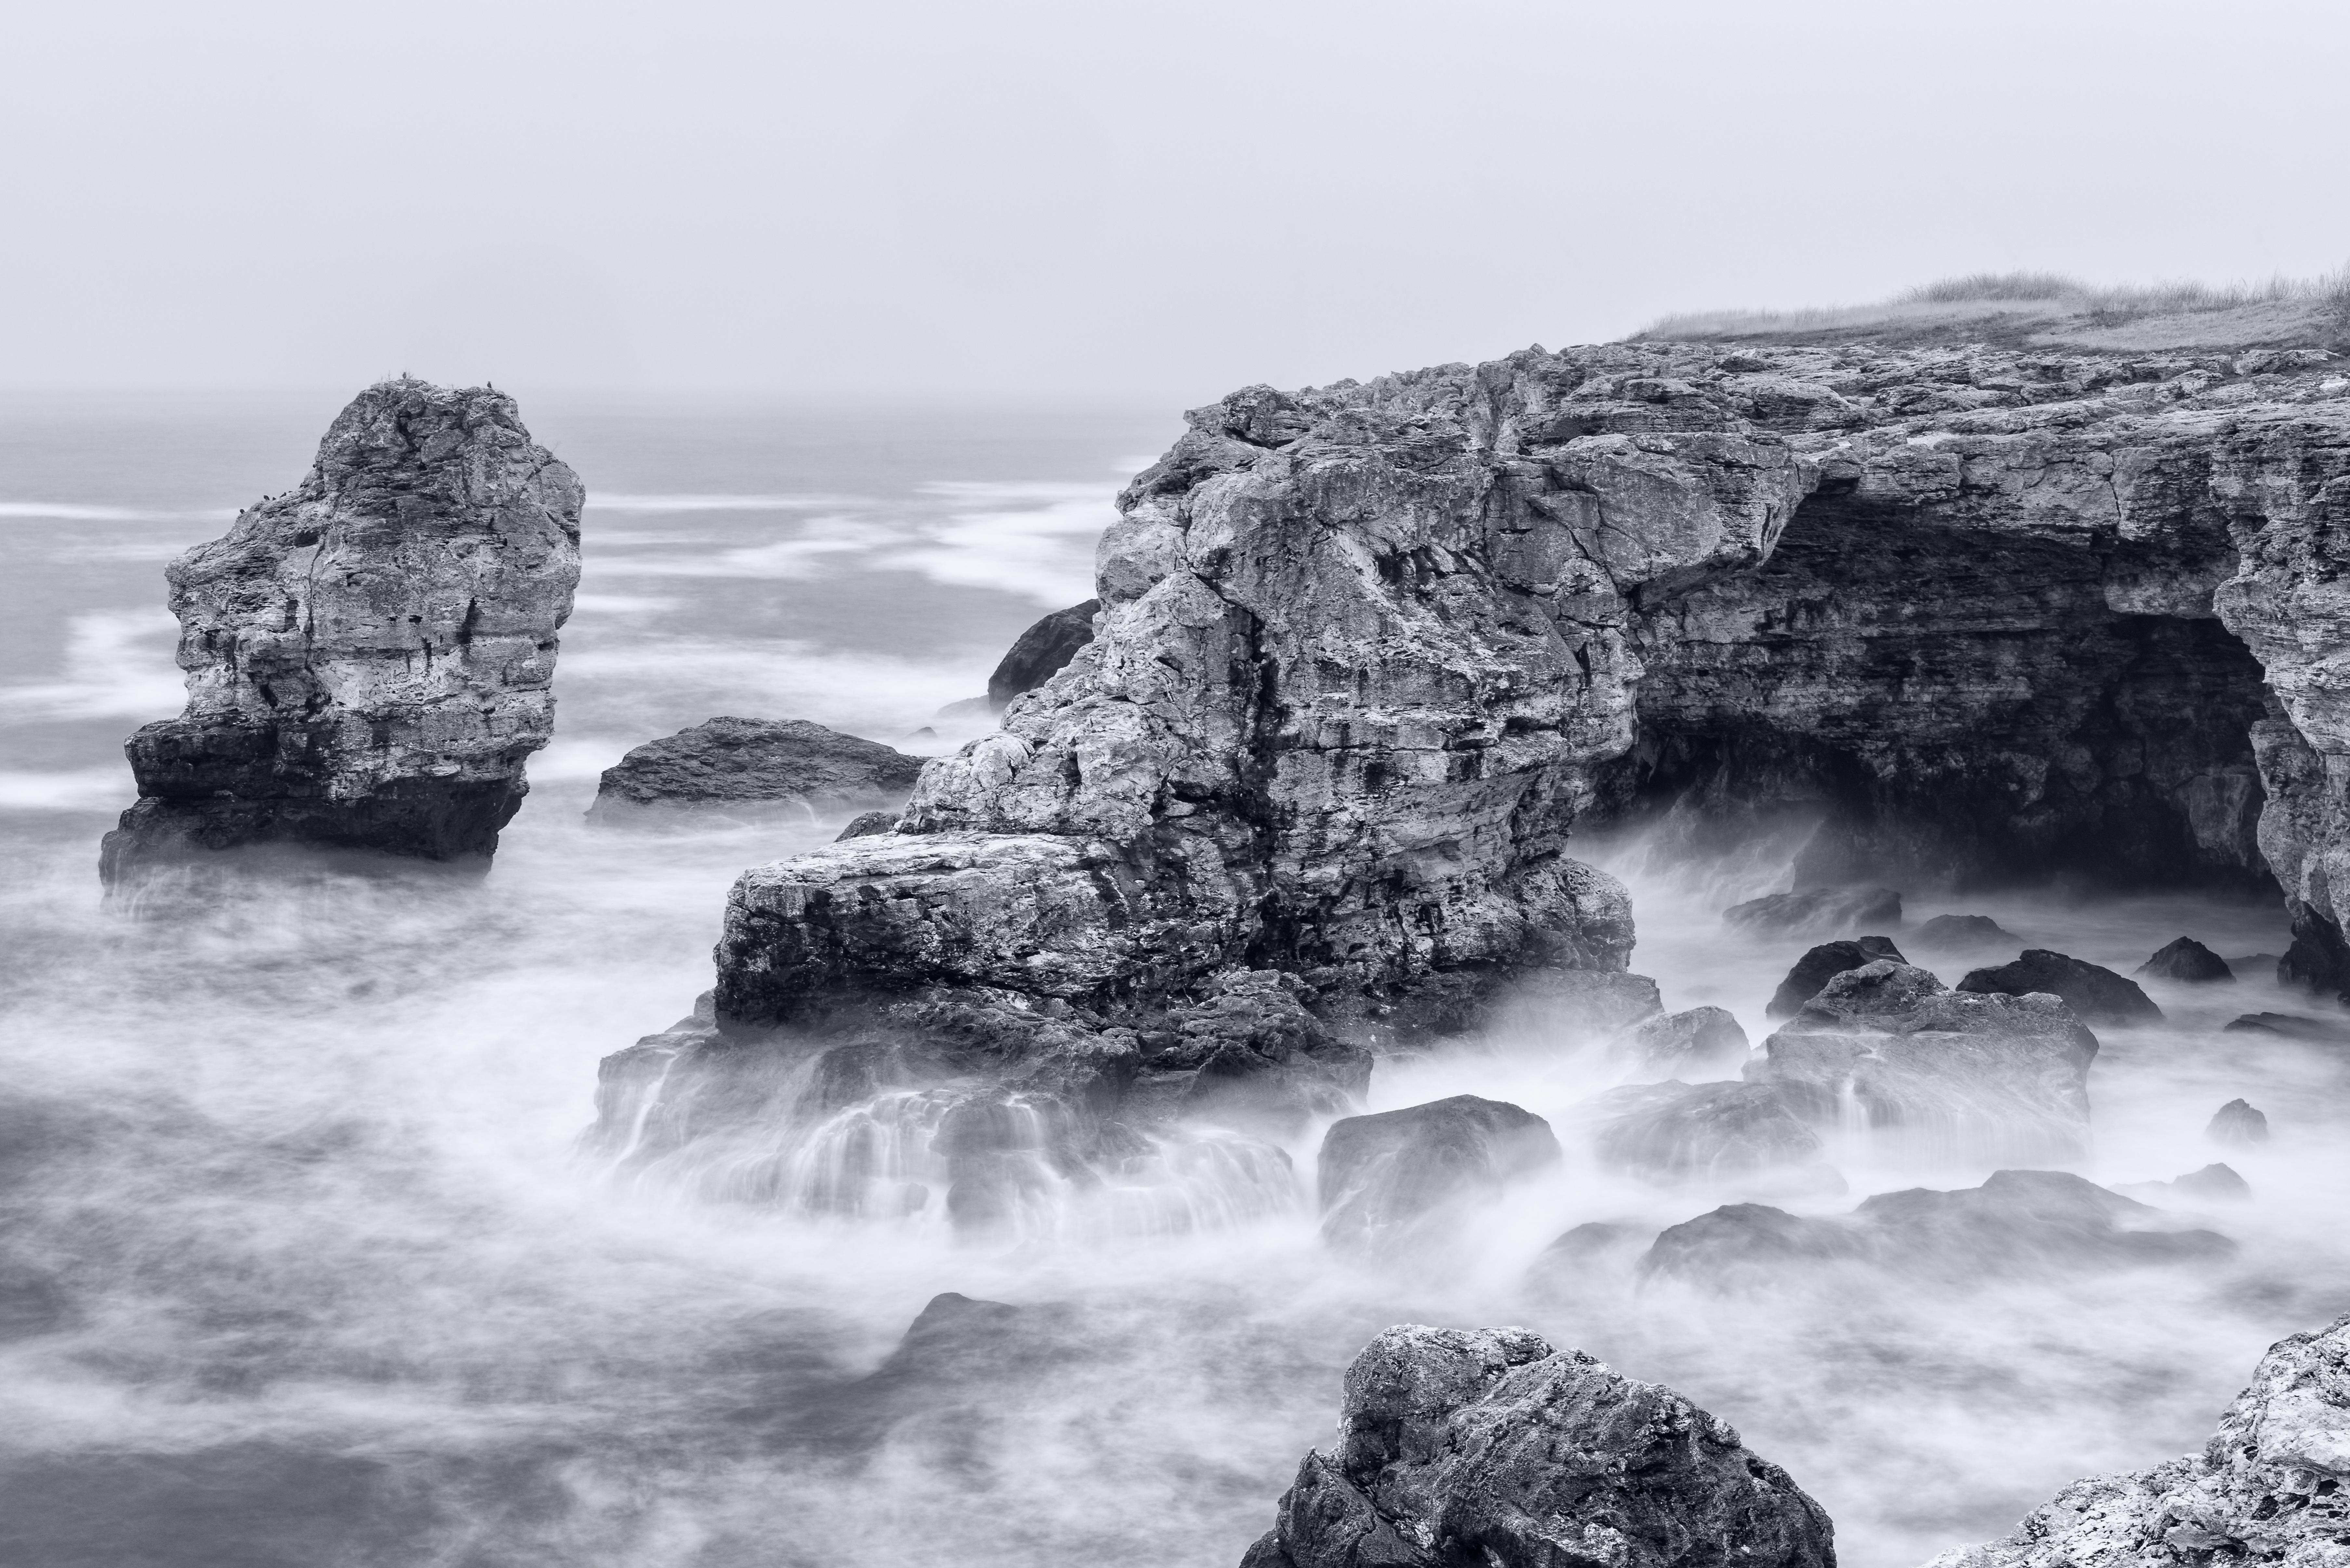 Free Images : landscape, sea, coast, nature, rock, ocean